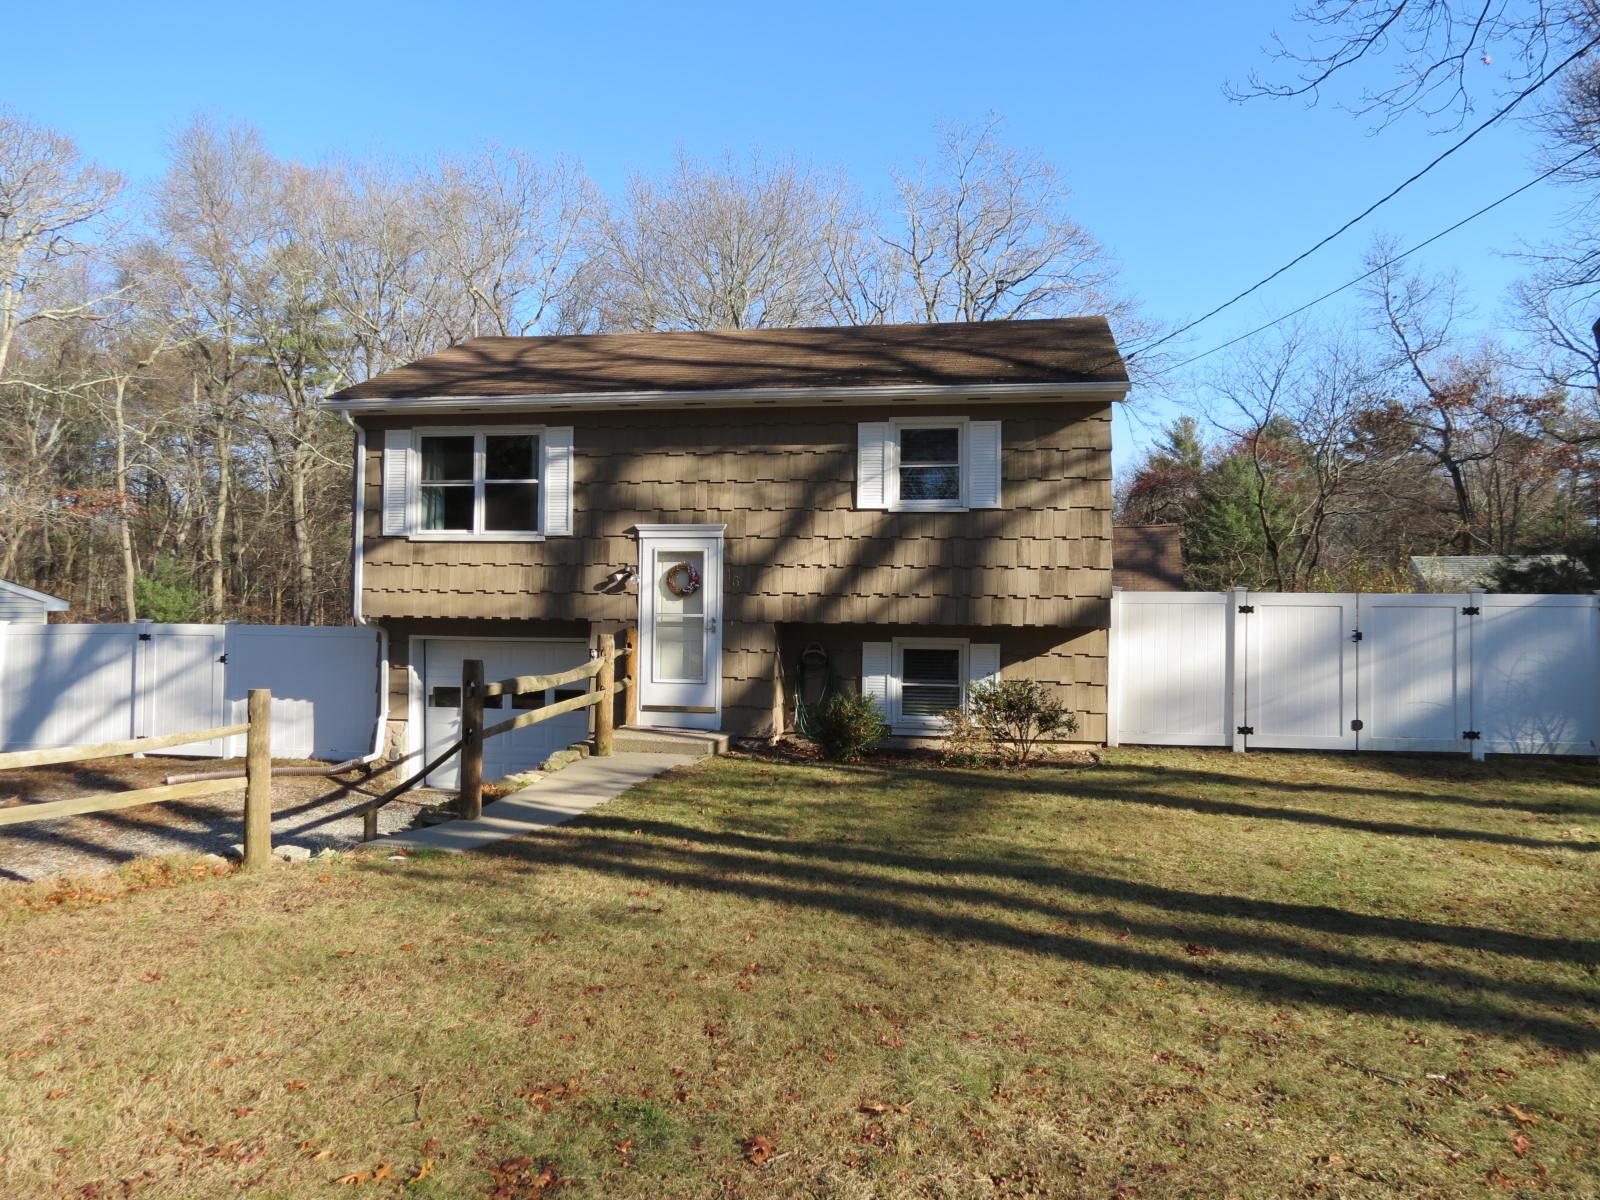 16 Tanglewood Lane, Voluntown, Connecticut 06384